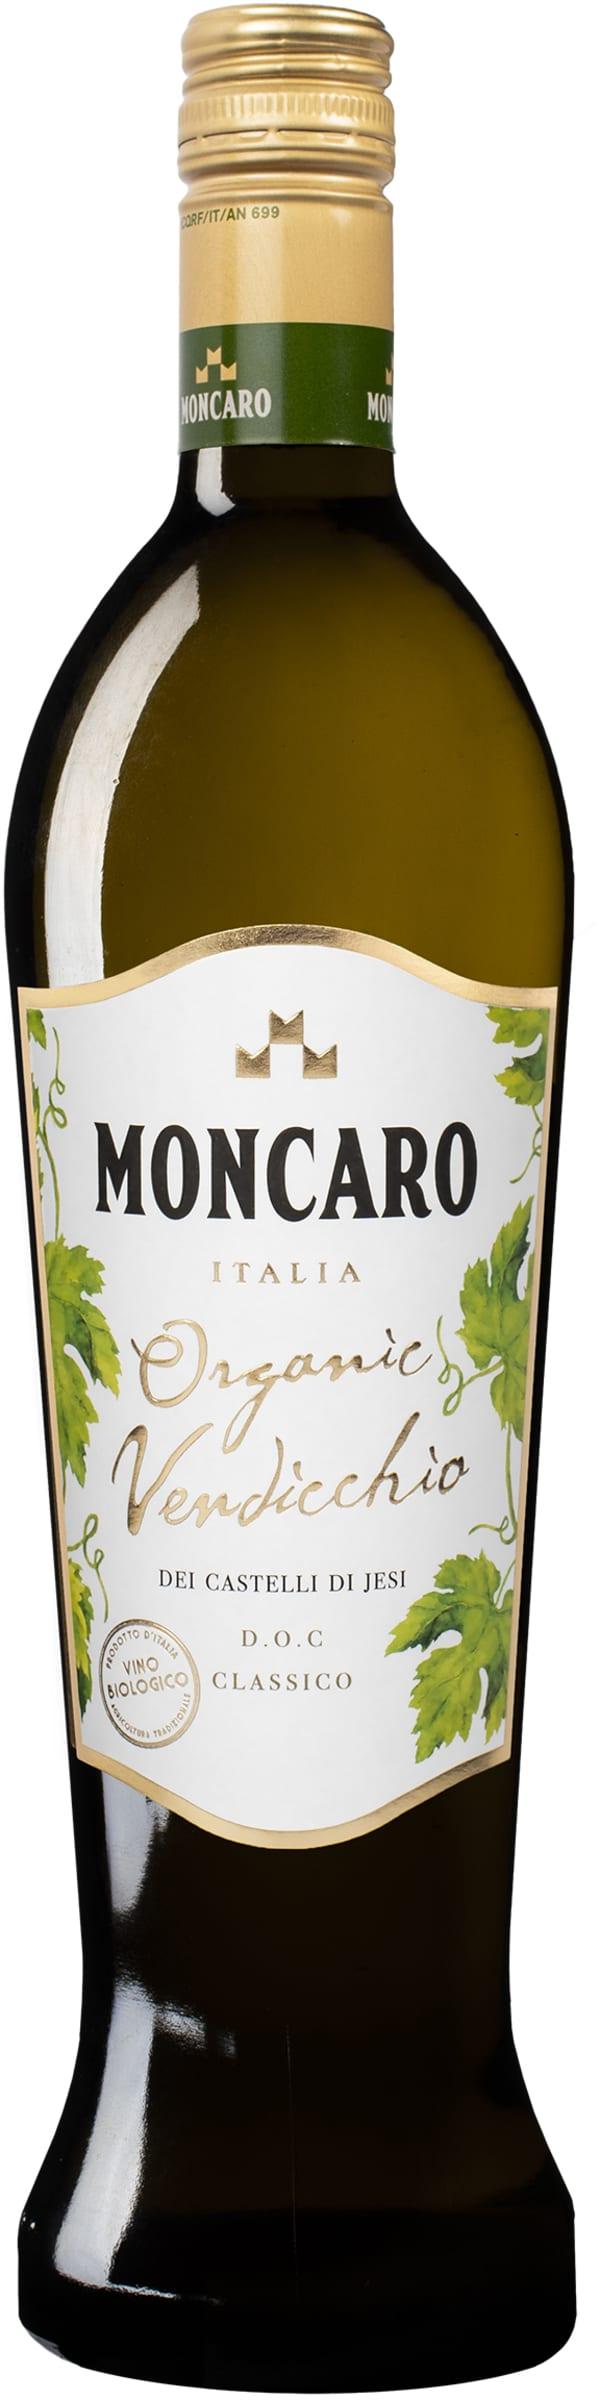 Moncaro Verdicchio dei Castelli di Jesi Classico Organic 2016